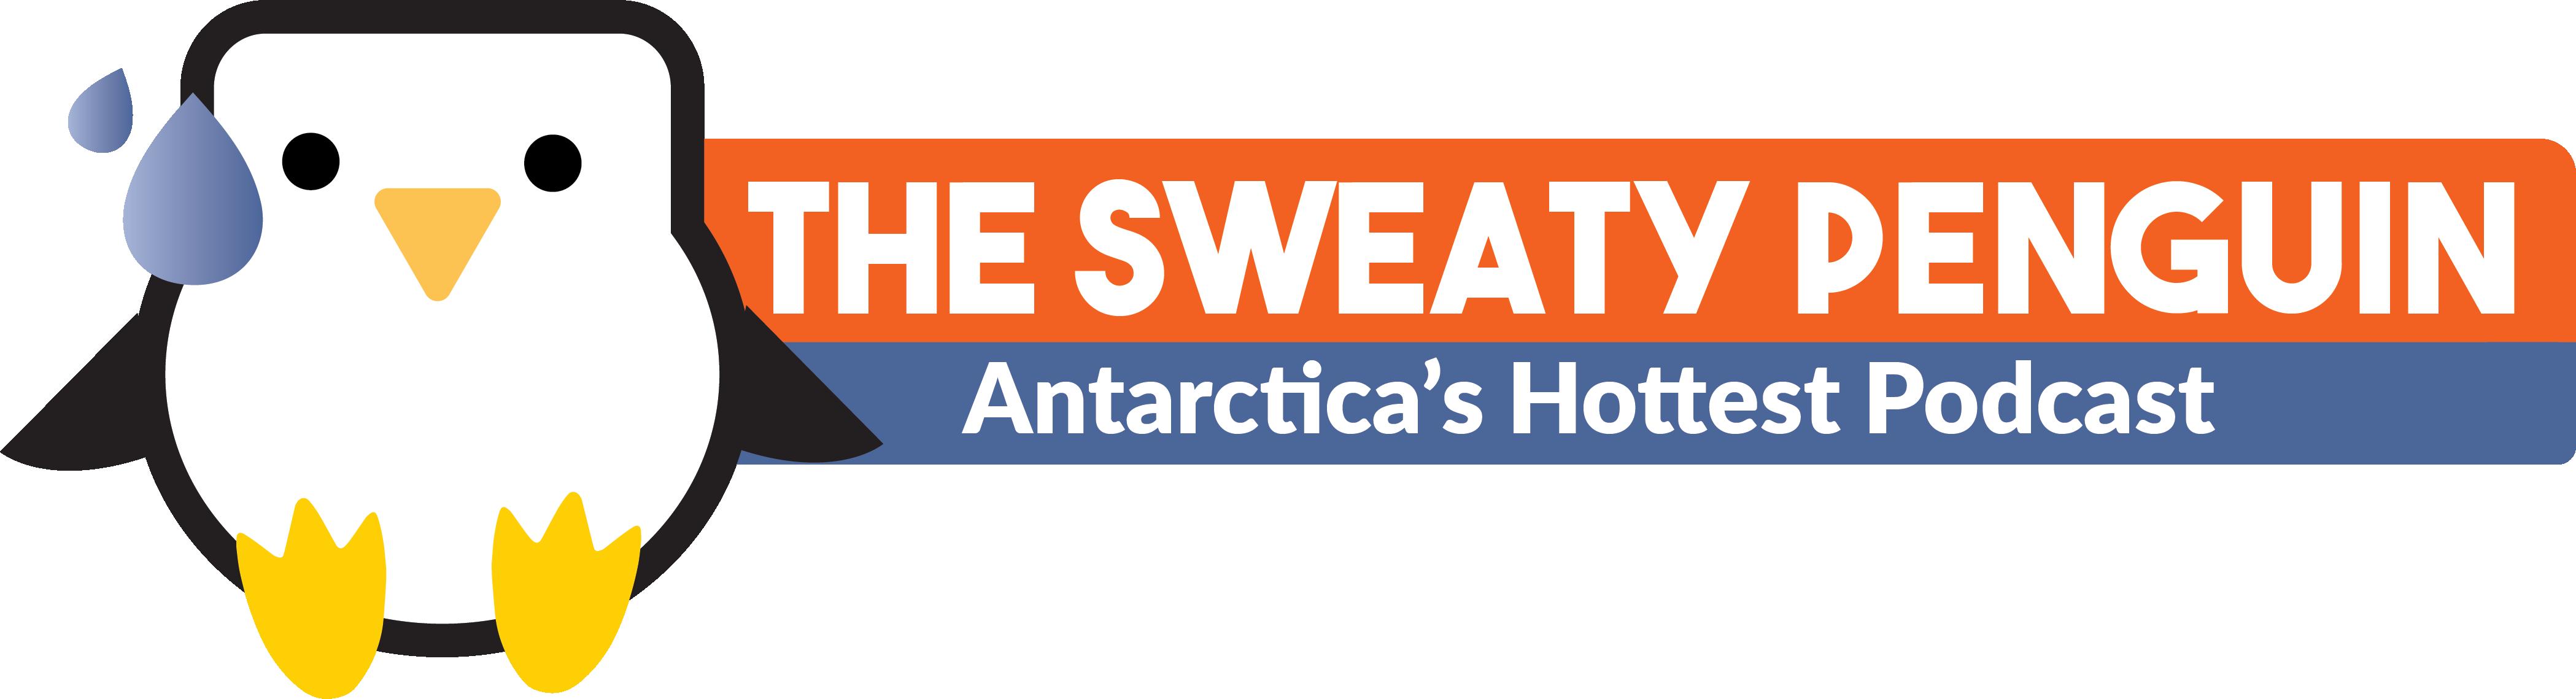 The Sweaty Penguin: Antarctica's Hottest Podcast